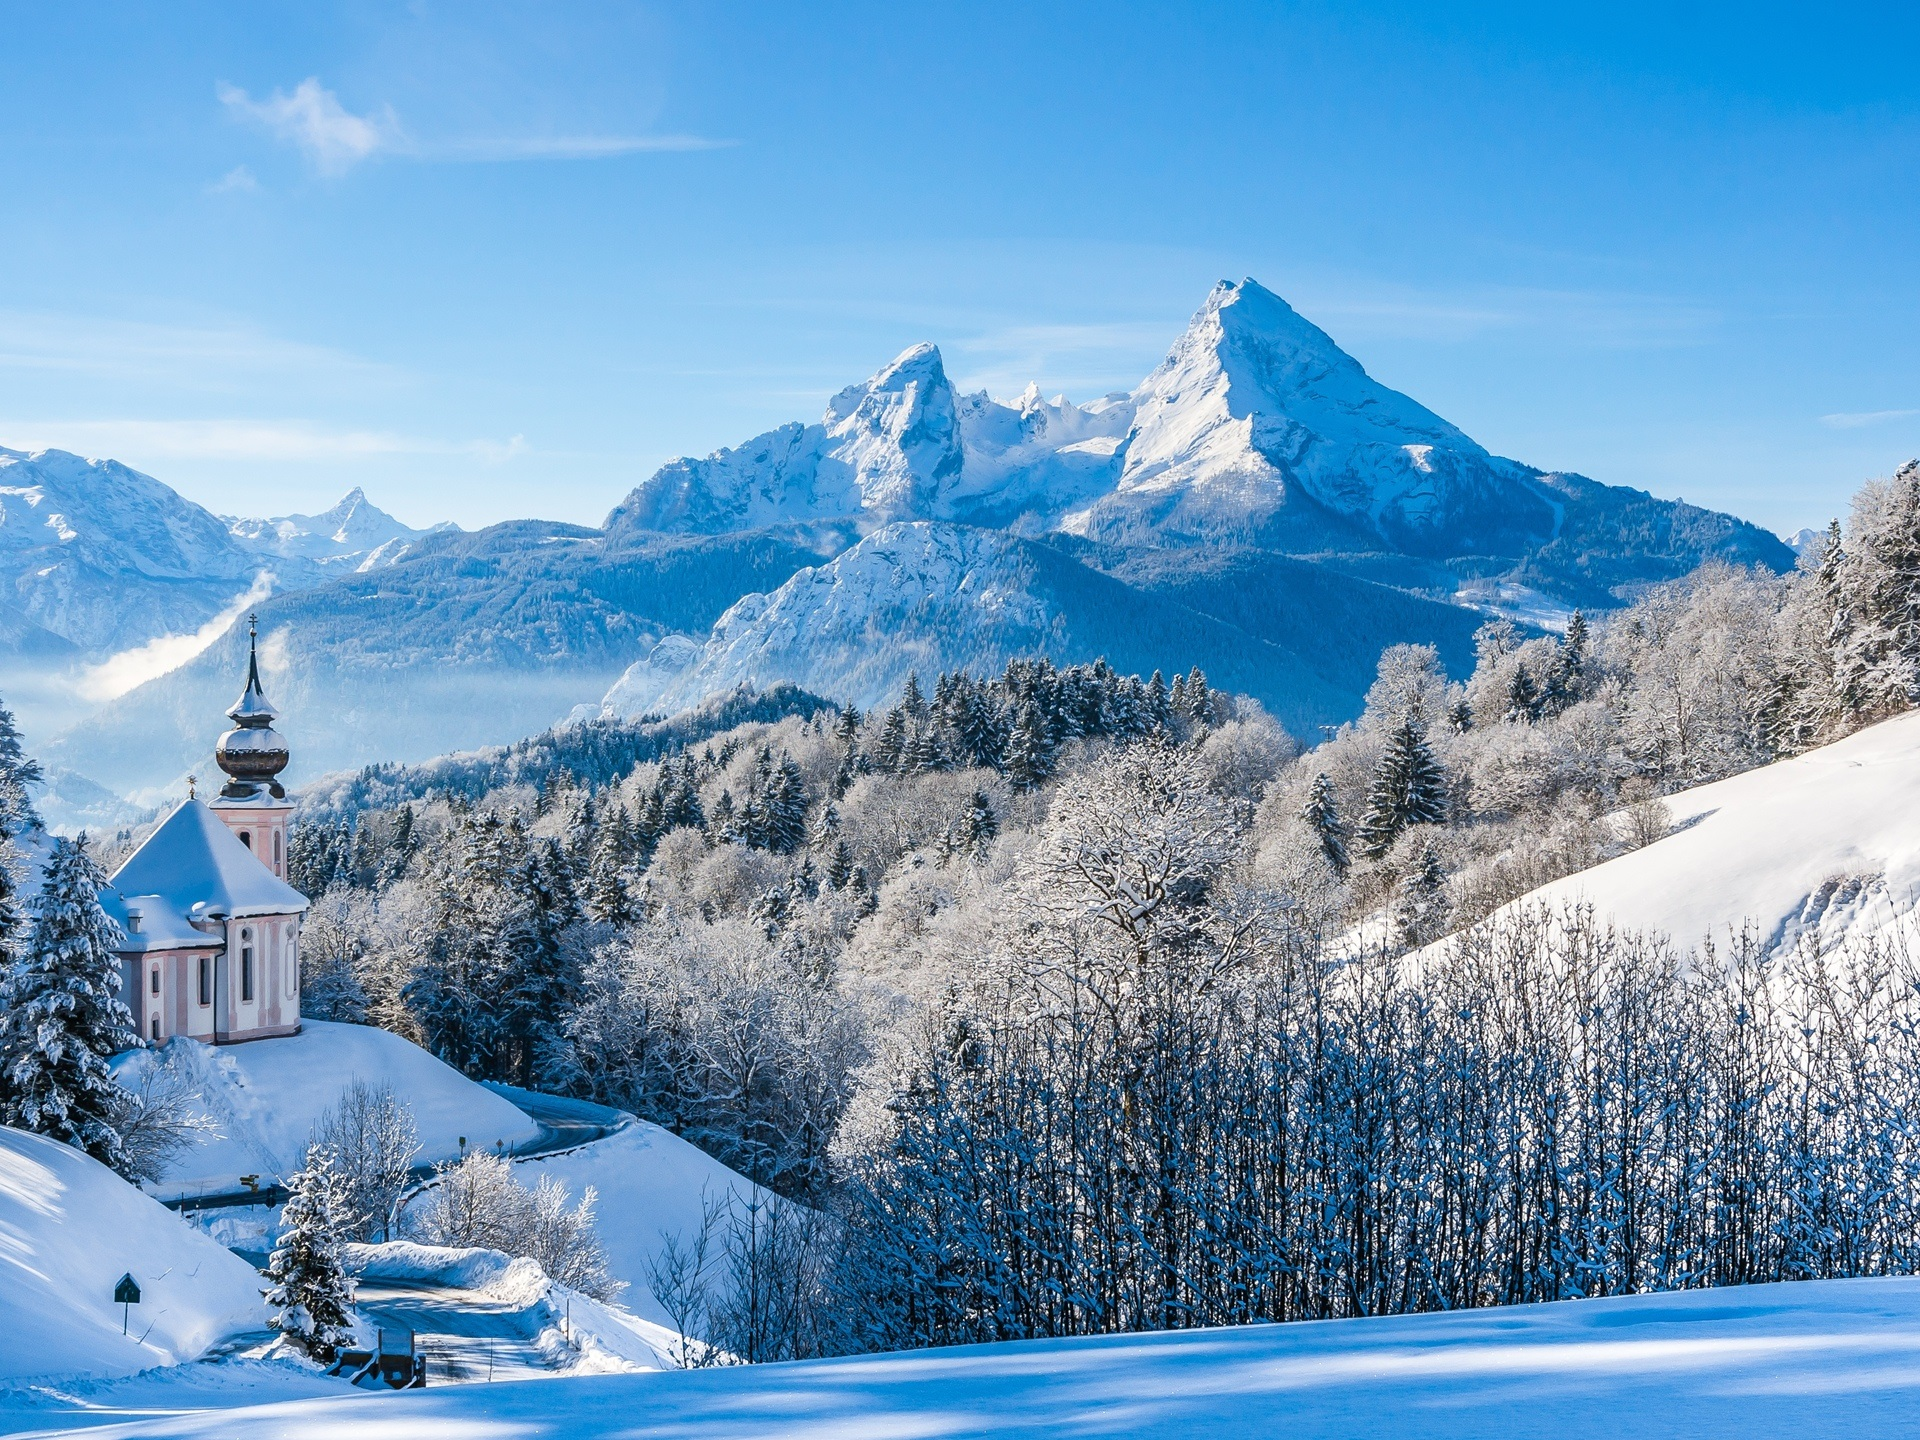 Fonds d 39 cran t l charger 1920x1440 hiver neige for Sfondi desktop inverno montagna